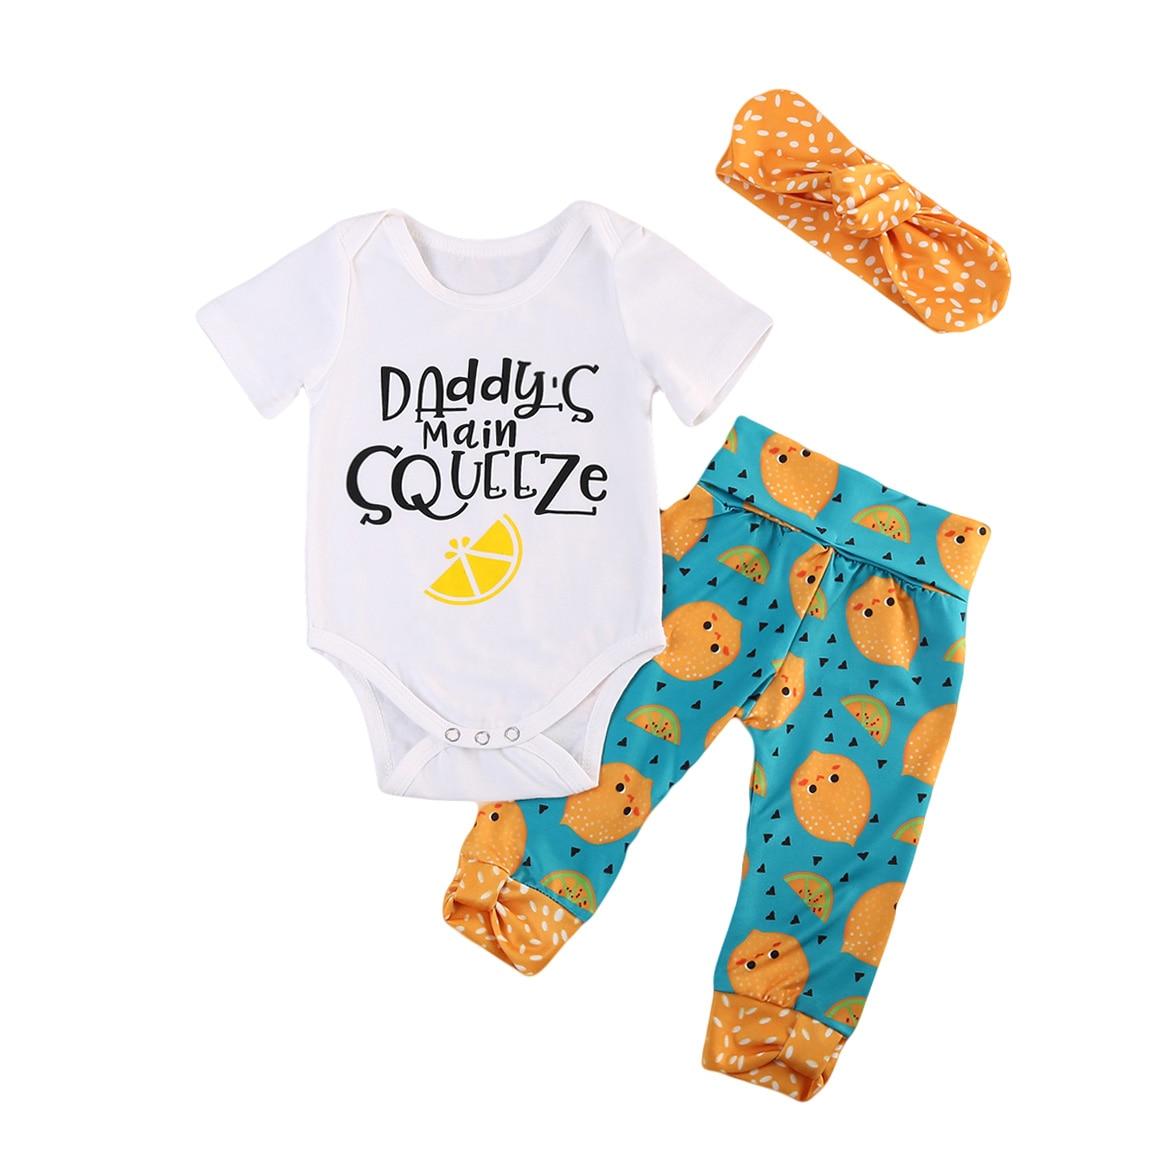 0-24 Mt Neugeborenen Baby Mädchen Kurzarm Papa Romper Lange Zitrone Hosen Leggings Outfits Set Kleidung